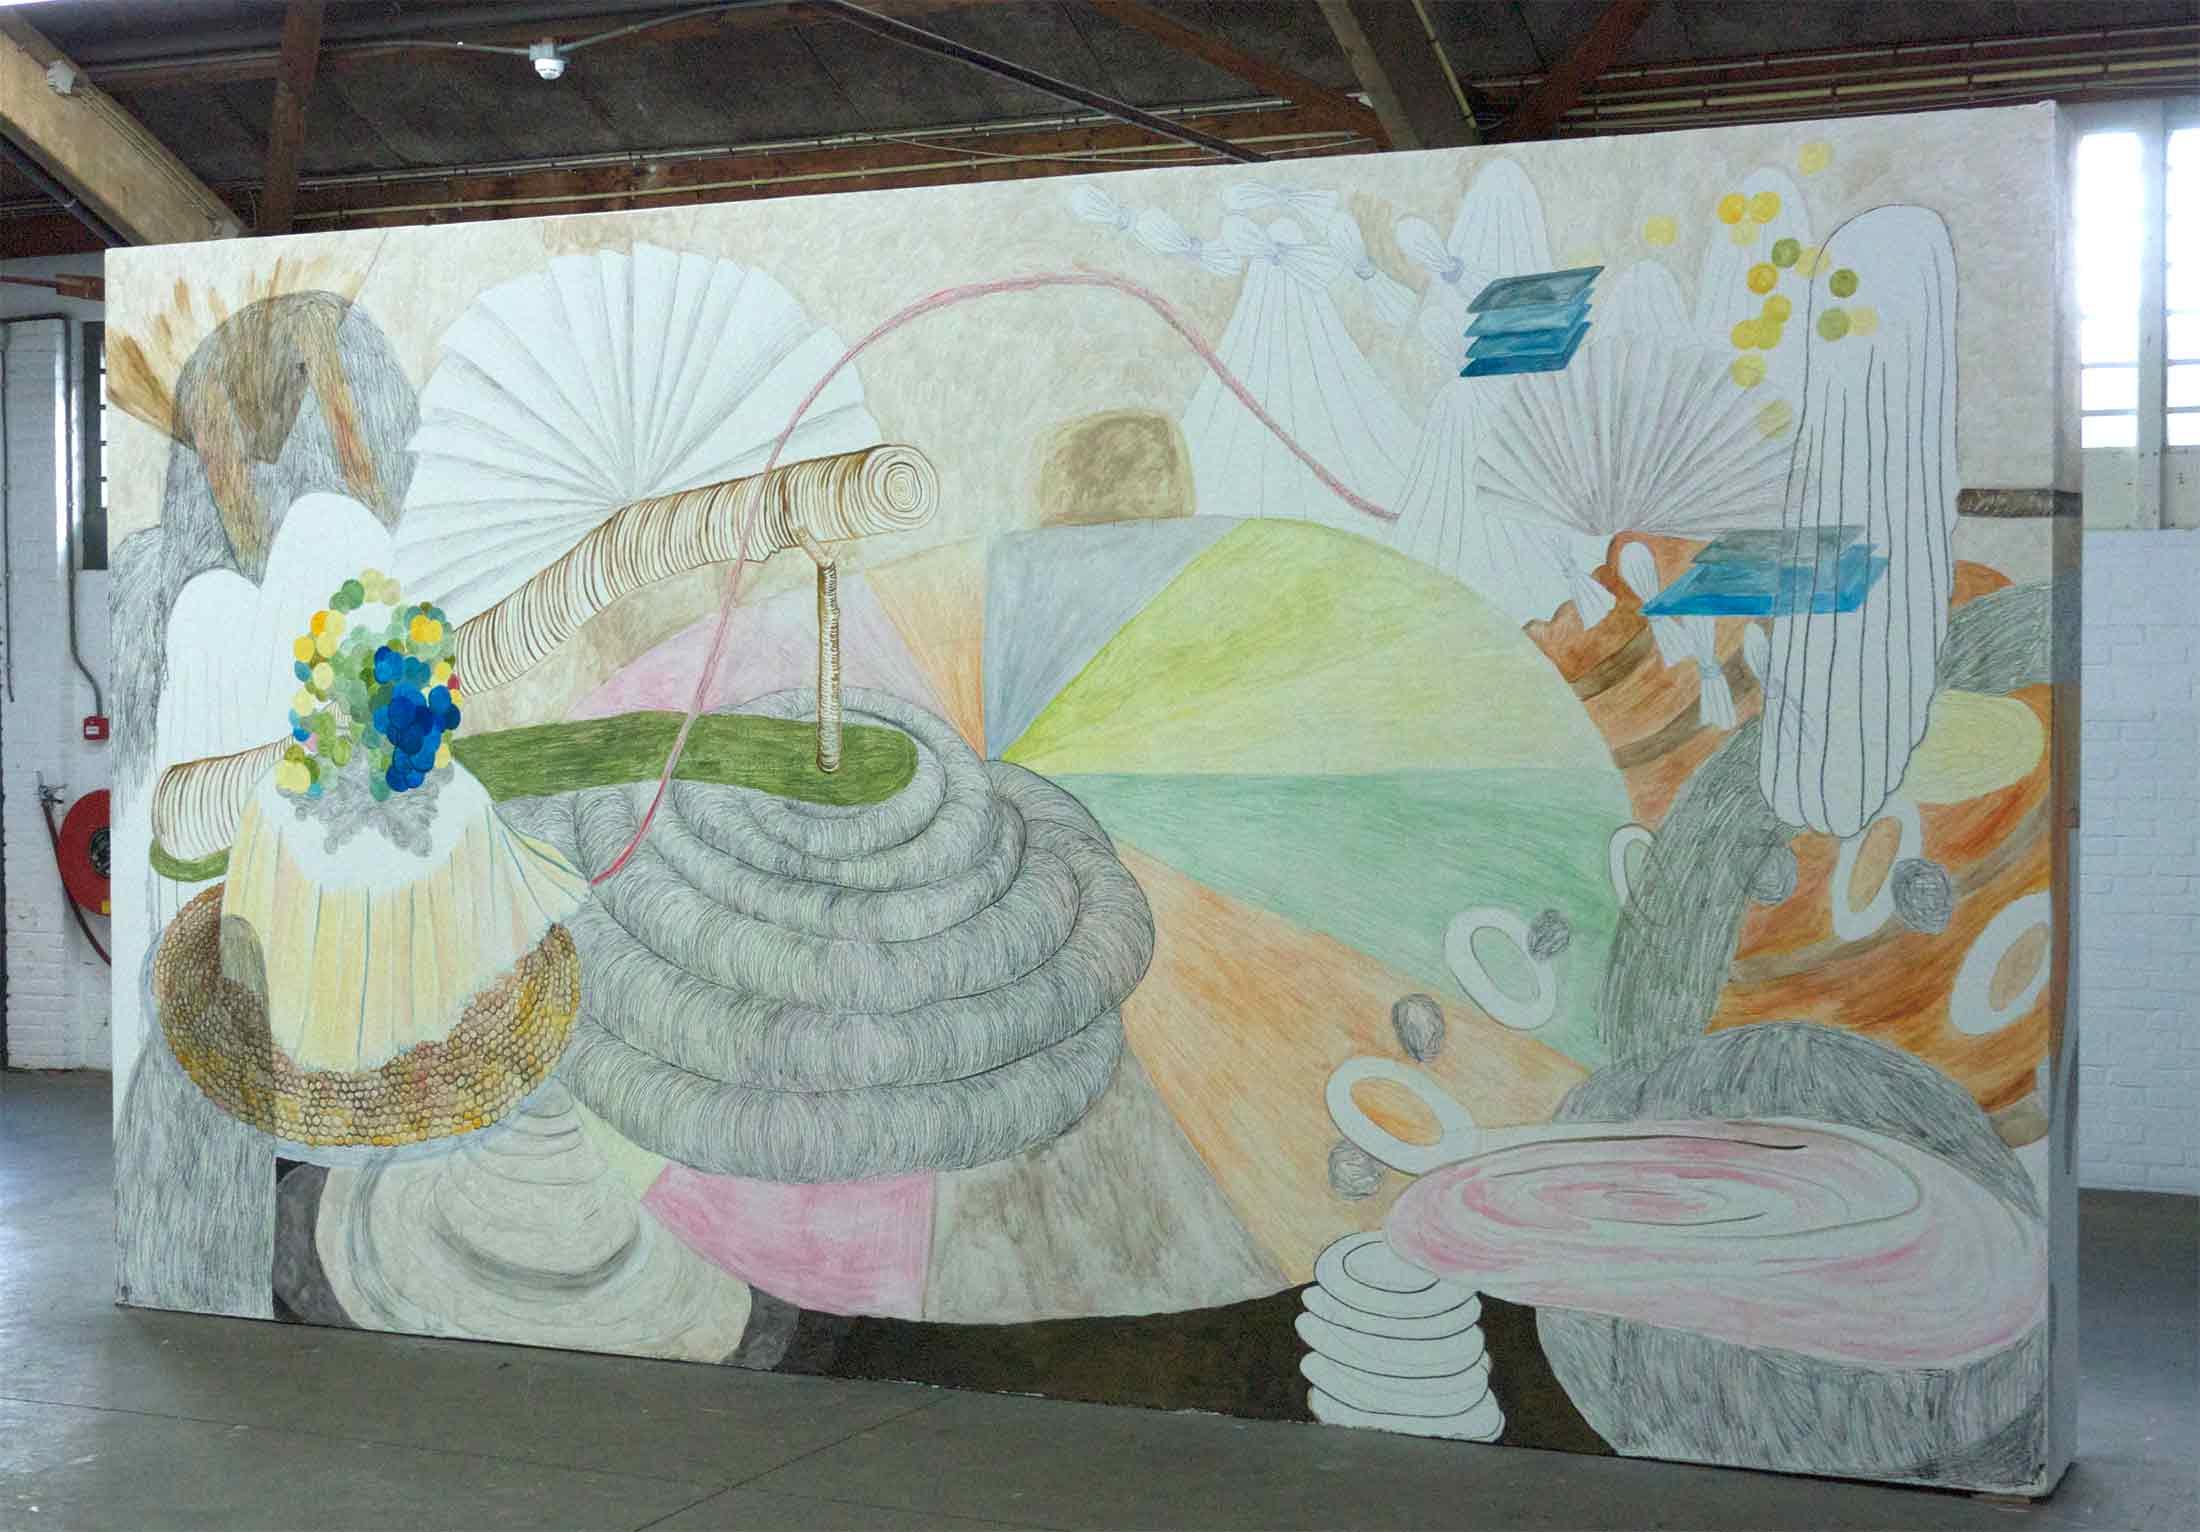 Starter  muurtekening in de Servicegarage, Amsterdam potlood, gouache, inkt, houtskool 205 x 500 cm, 2014